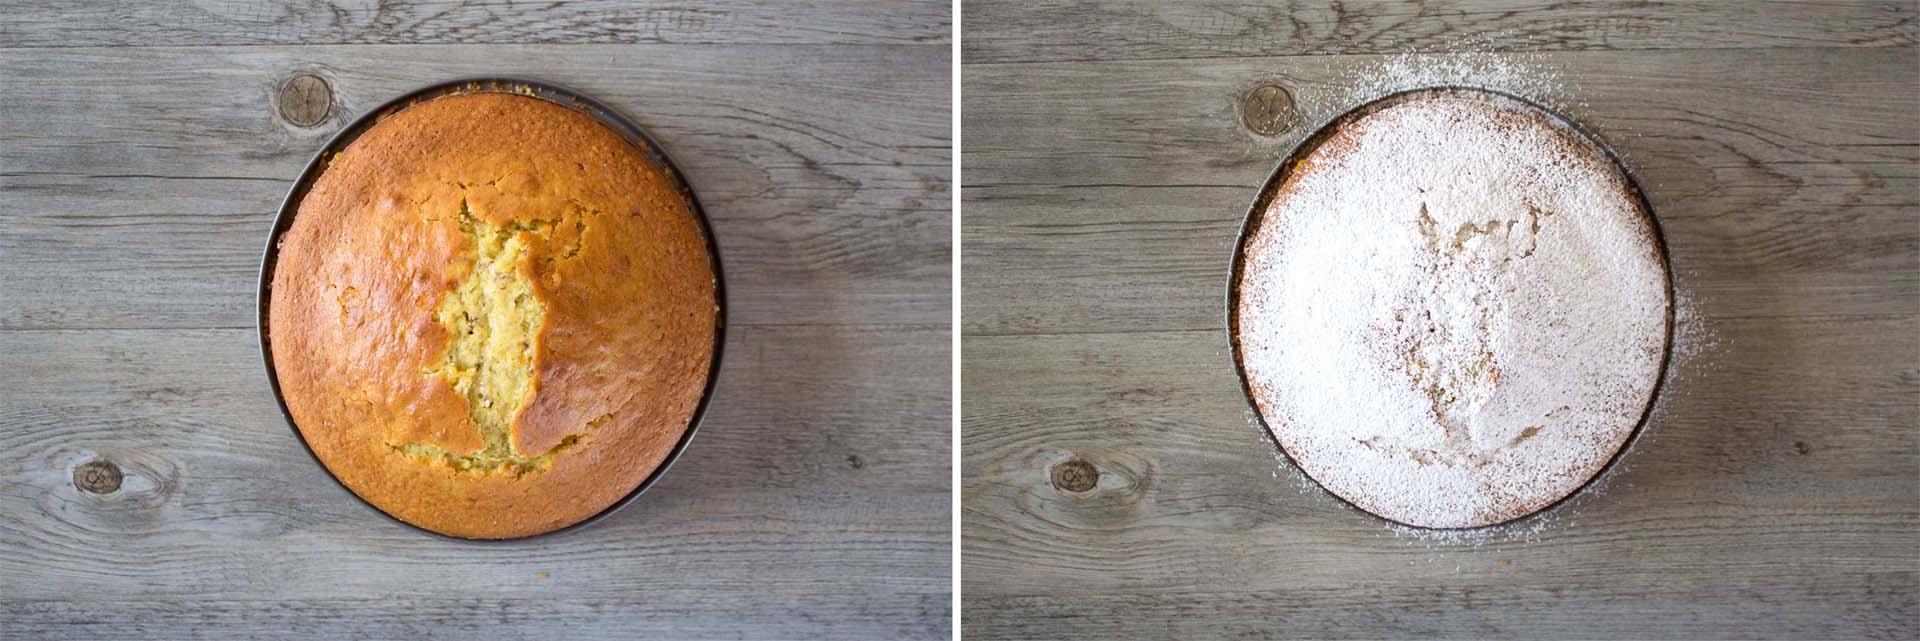 torta all'olio d'oliva, arance e mandorle zucchero a velo